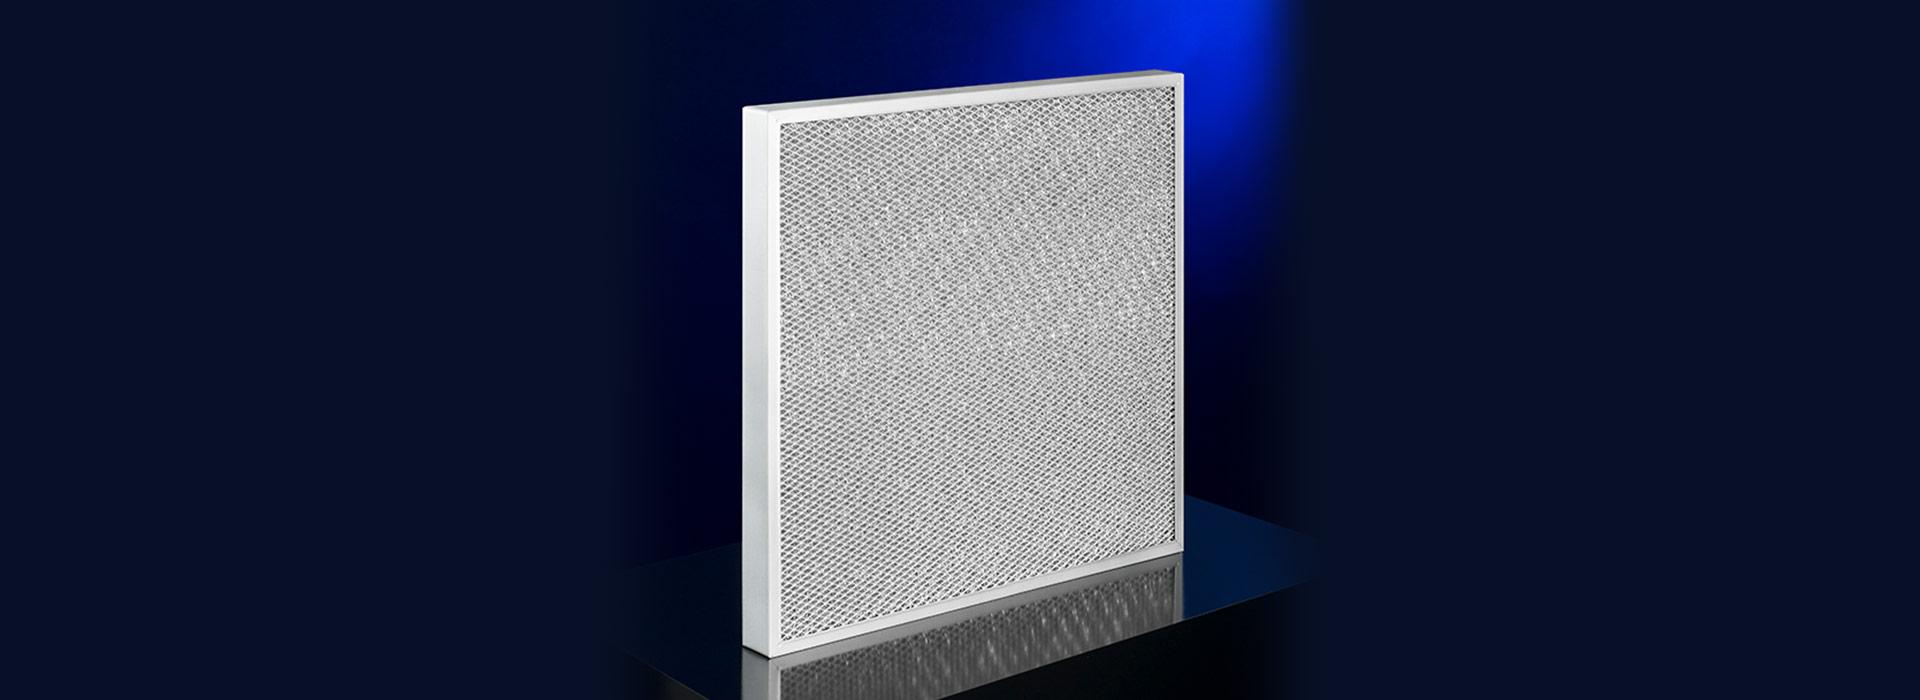 Activated Carbon Filters Kalthoff Luftfilter Und